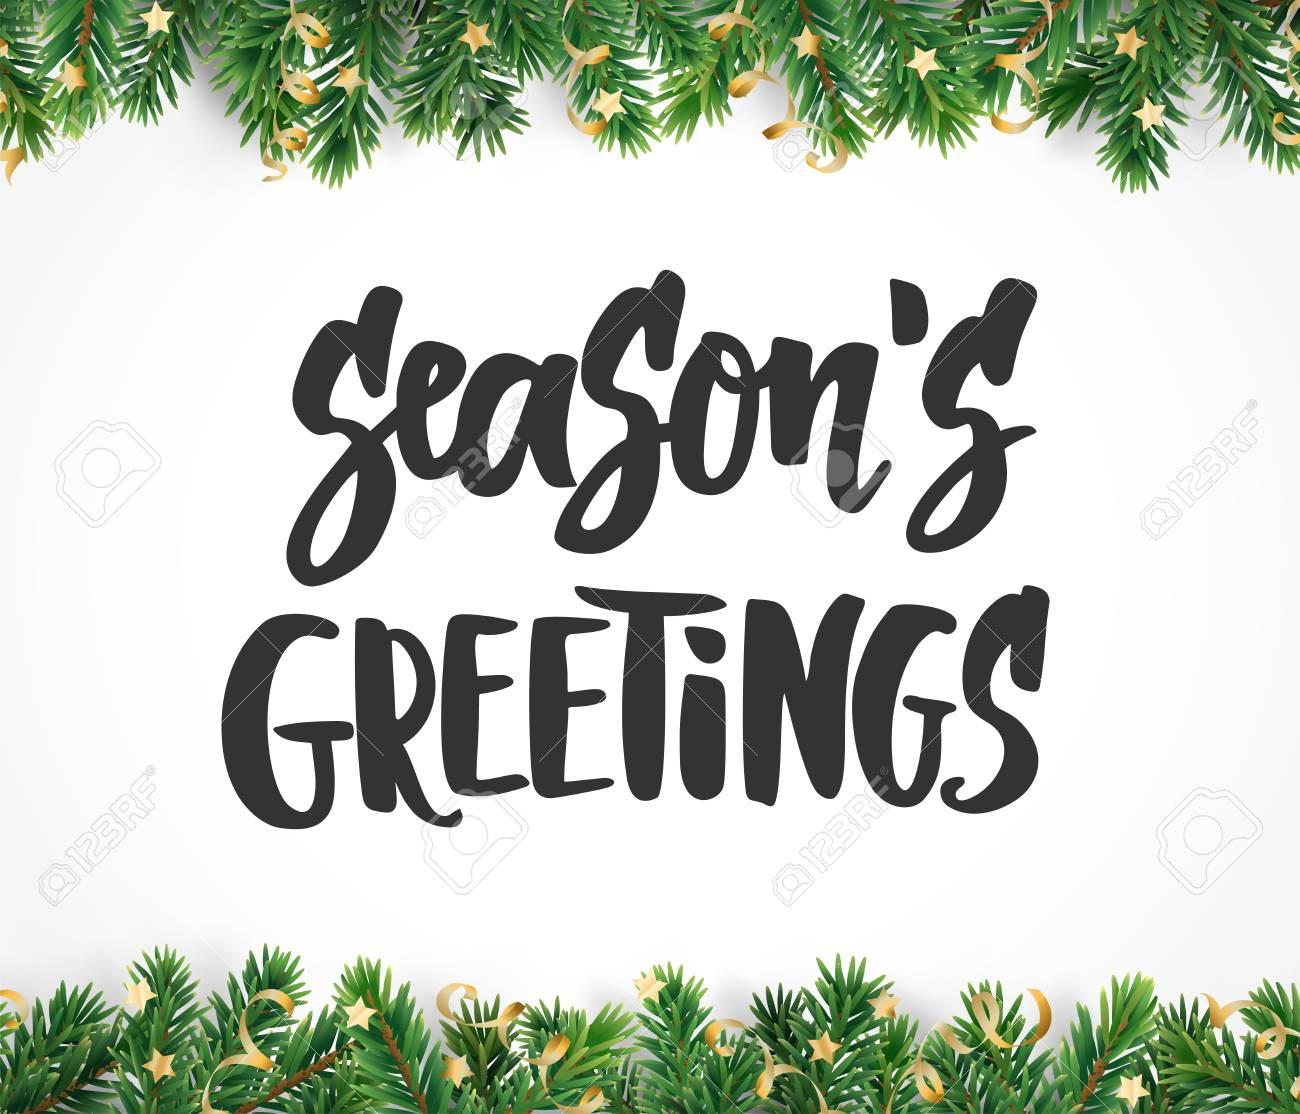 Seasons greetings text hand drawn brush lettering holiday quote seasons greetings text hand drawn brush lettering holiday quote isolated on white great kristyandbryce Images